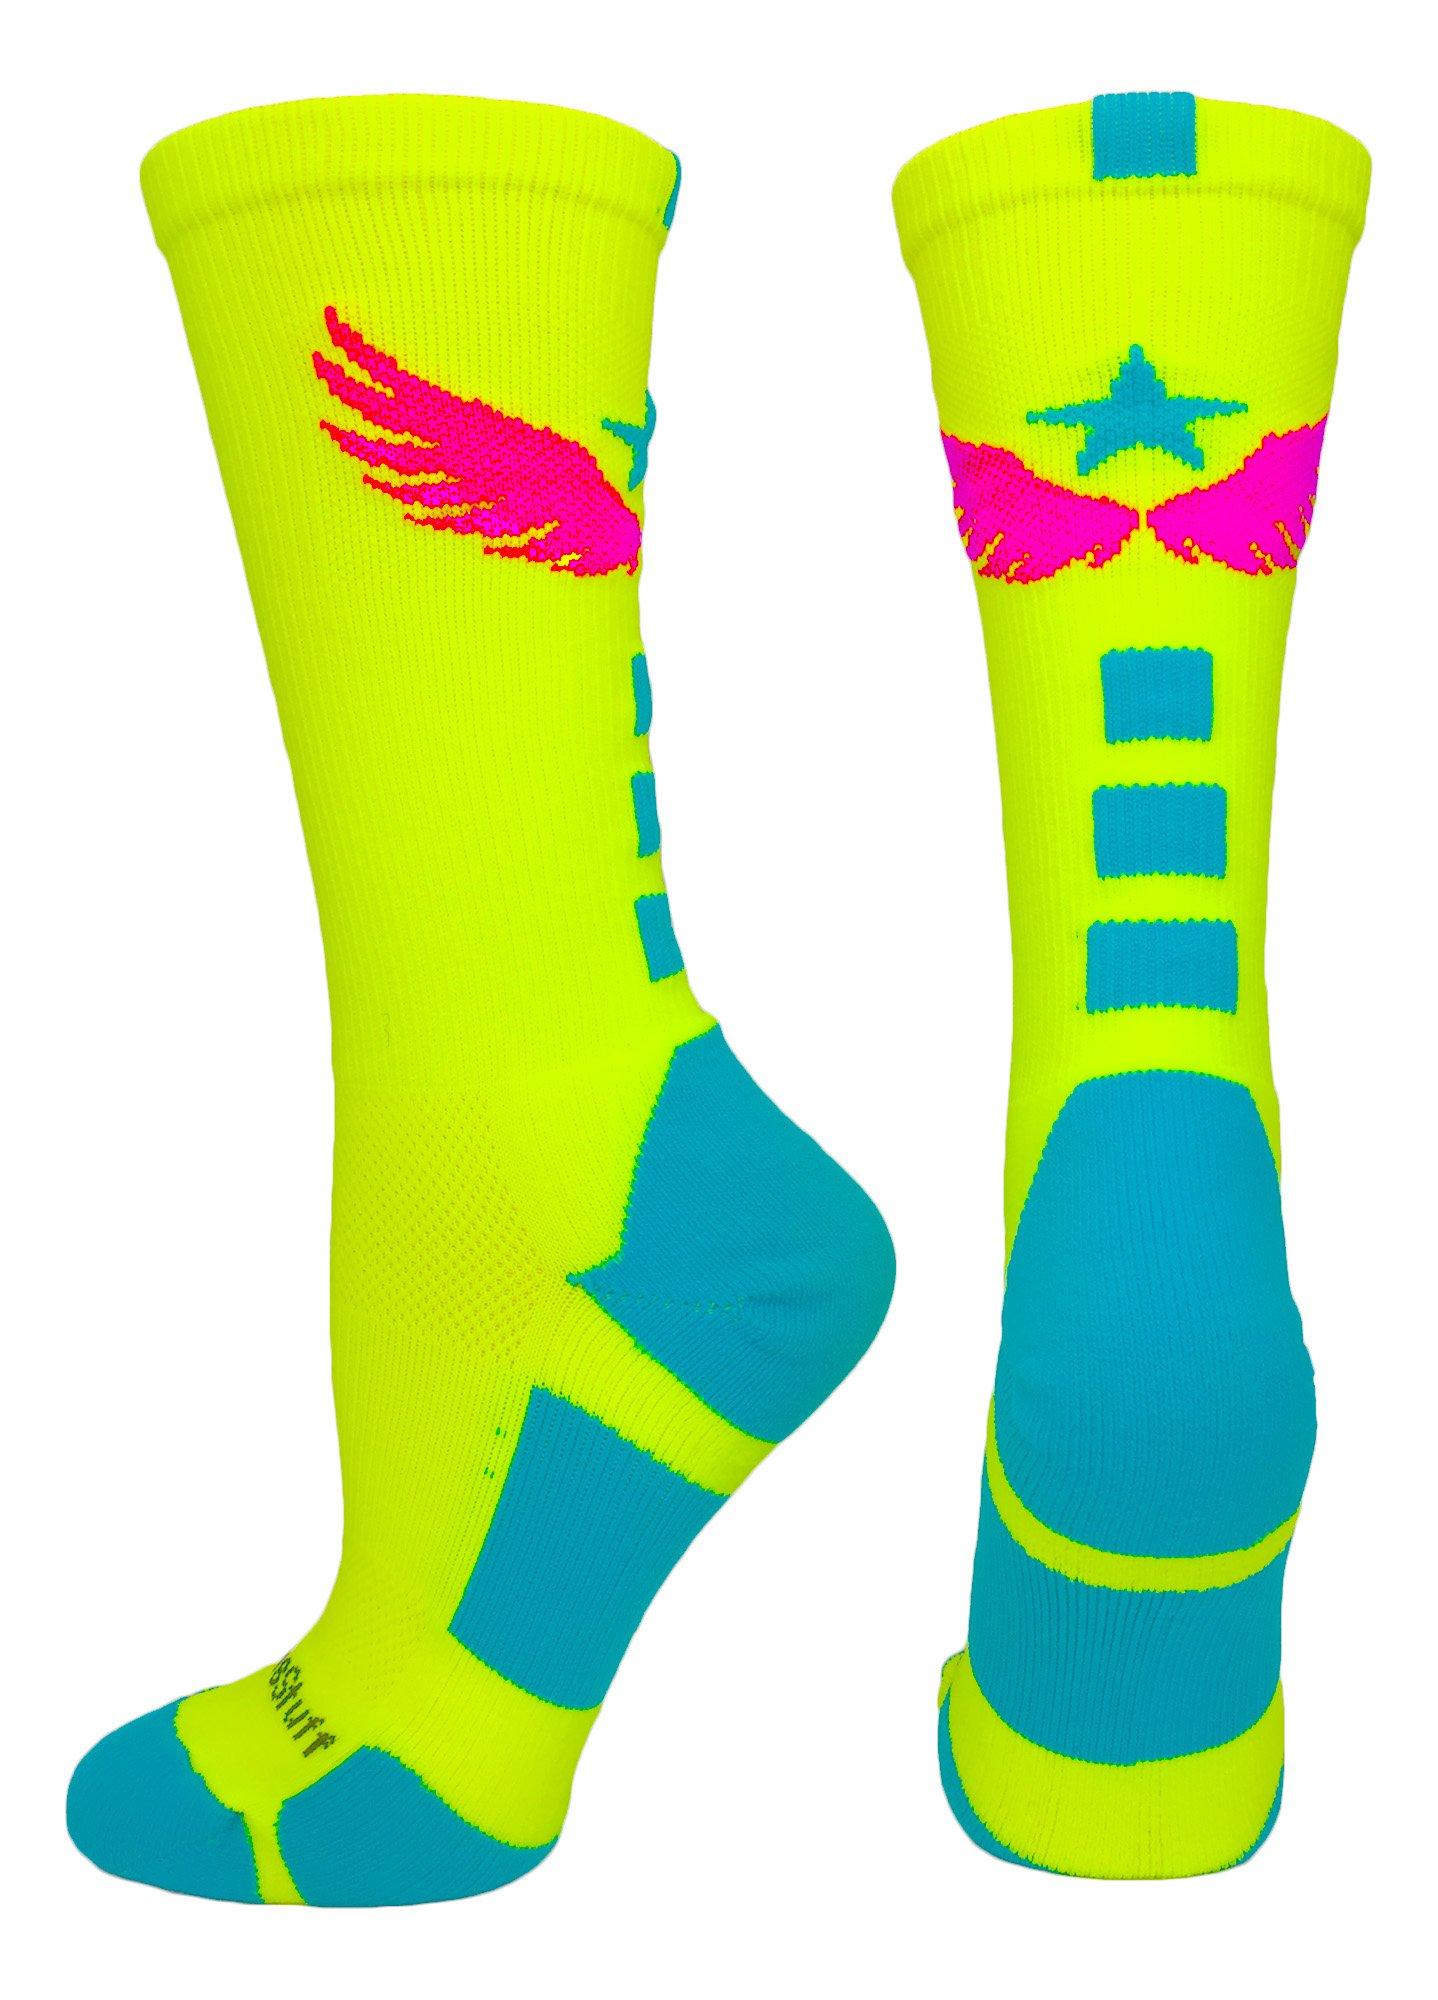 MadSportsStuff Light Speed Athletic Crew Socks (Neon Yellow/Electric Blue/Neon Pink, Medium) by MadSportsStuff